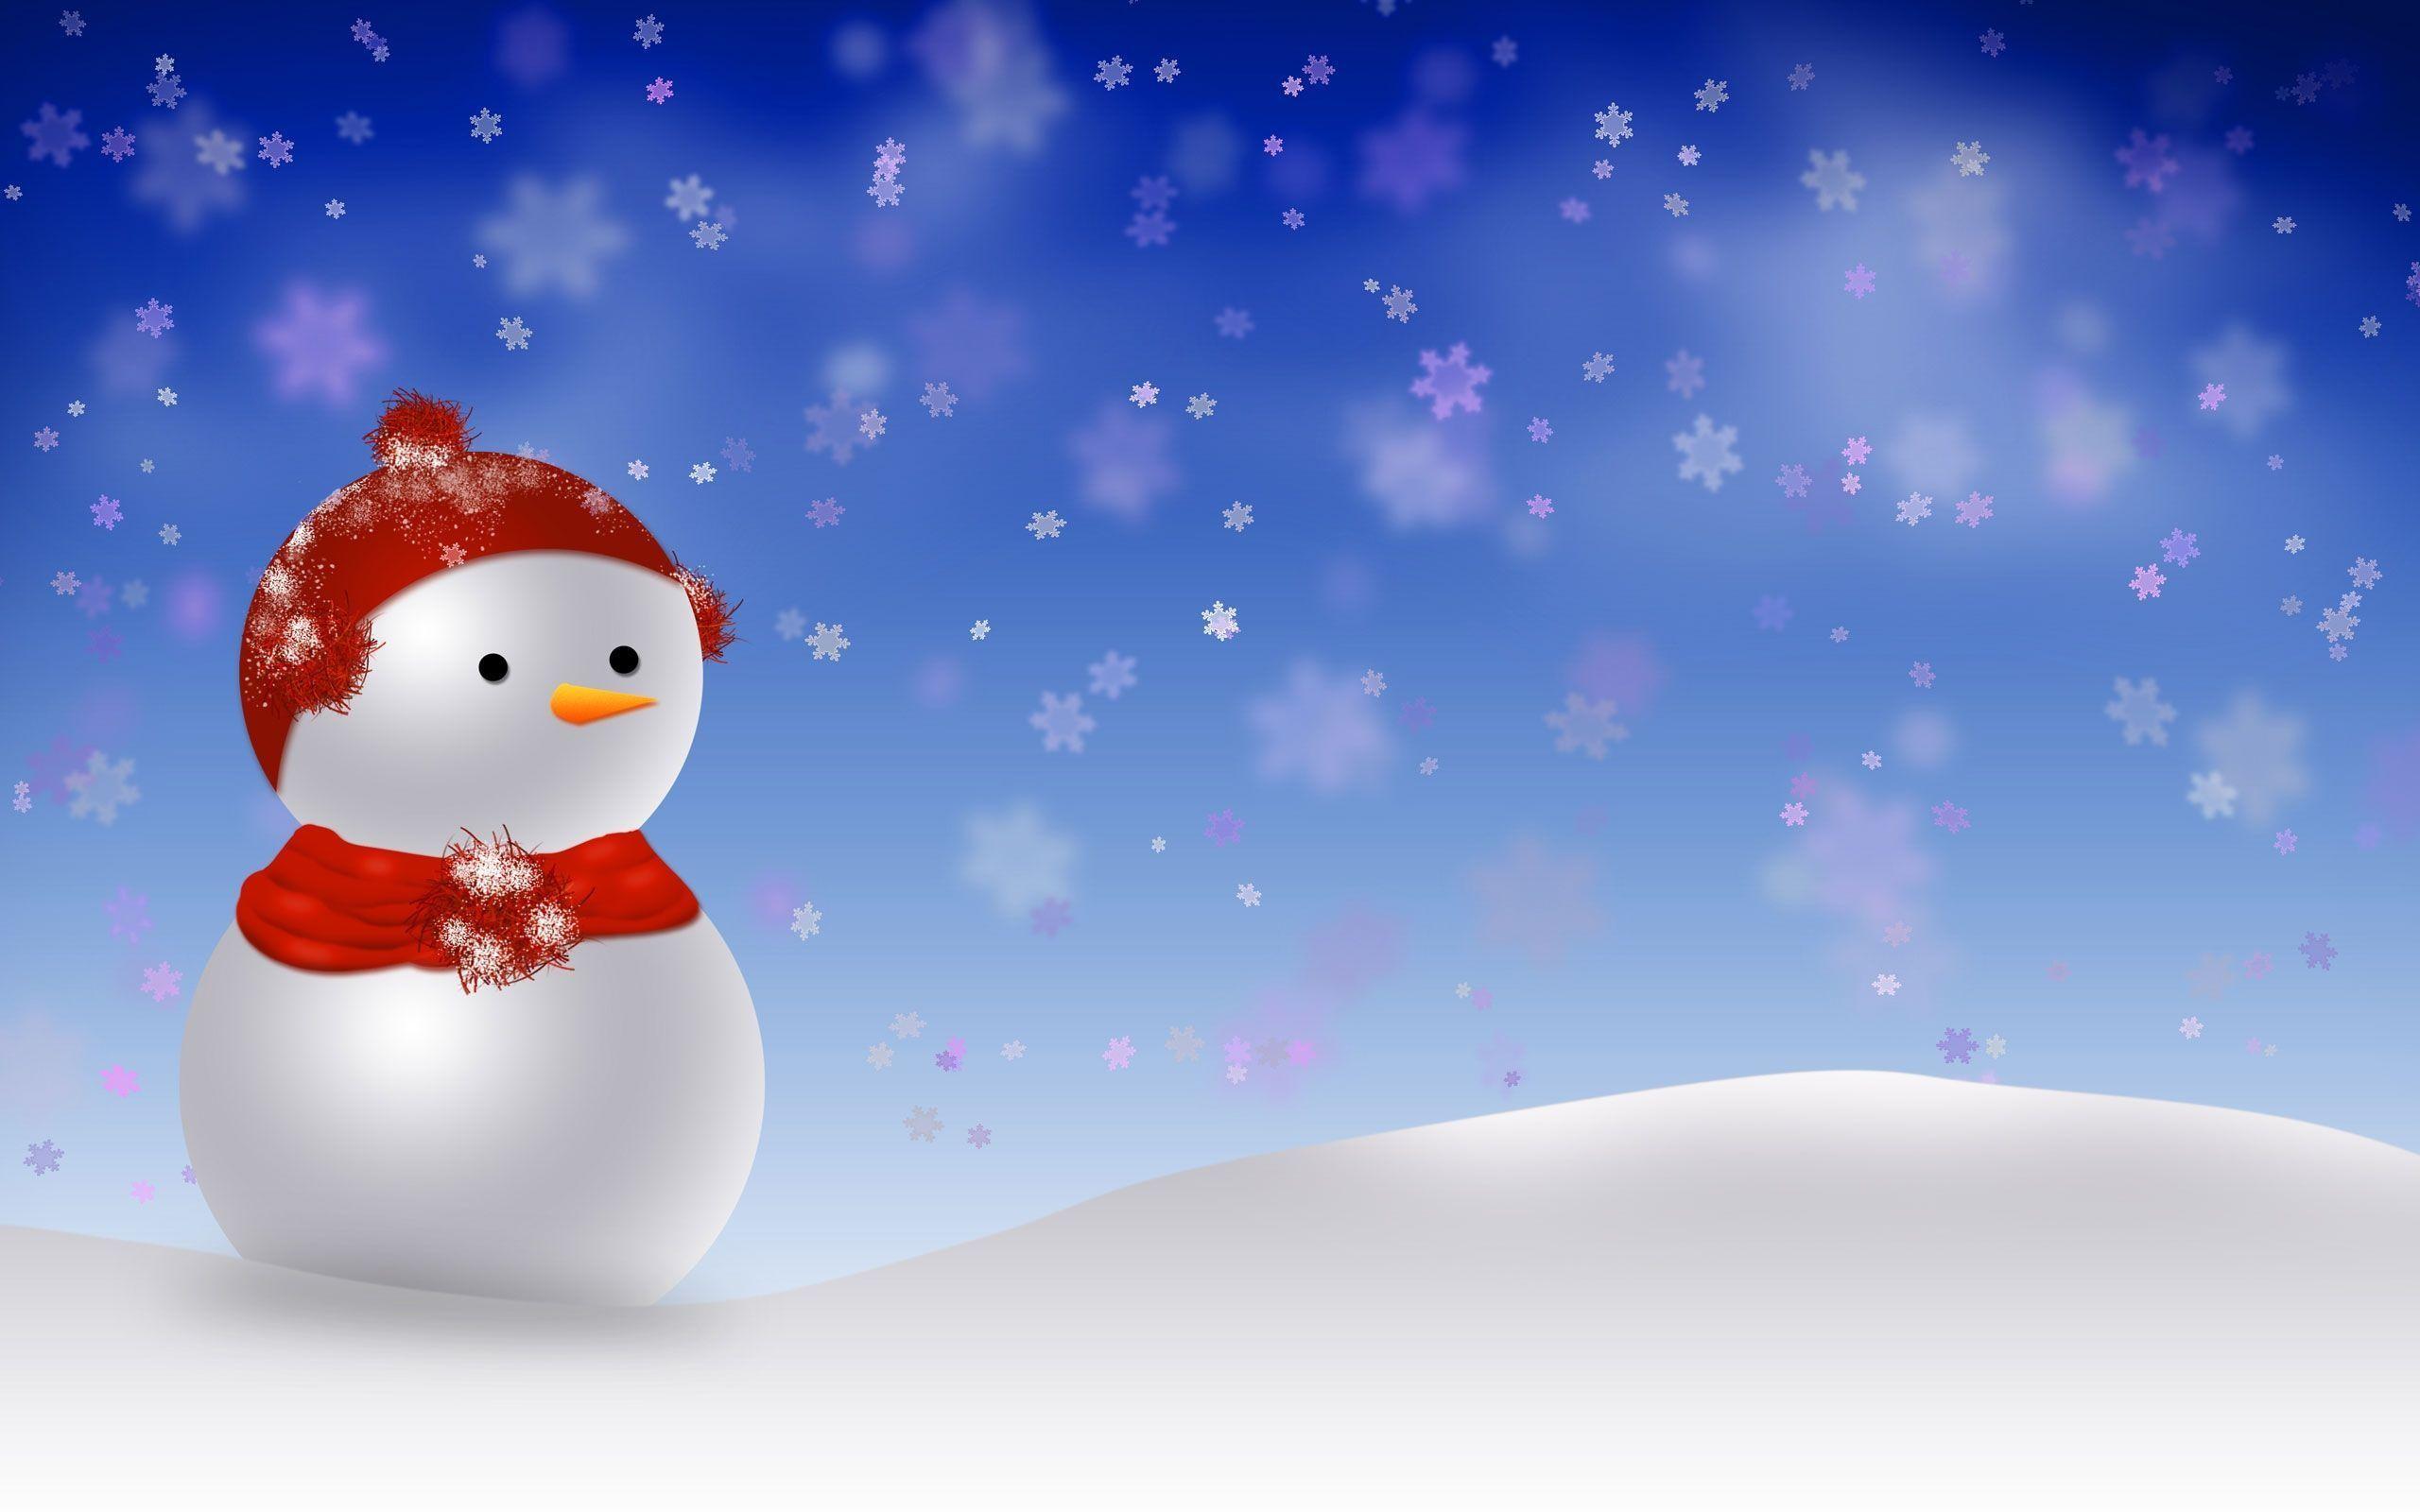 Cute Animated Merry Christmas Desktop Background Wallpaper .